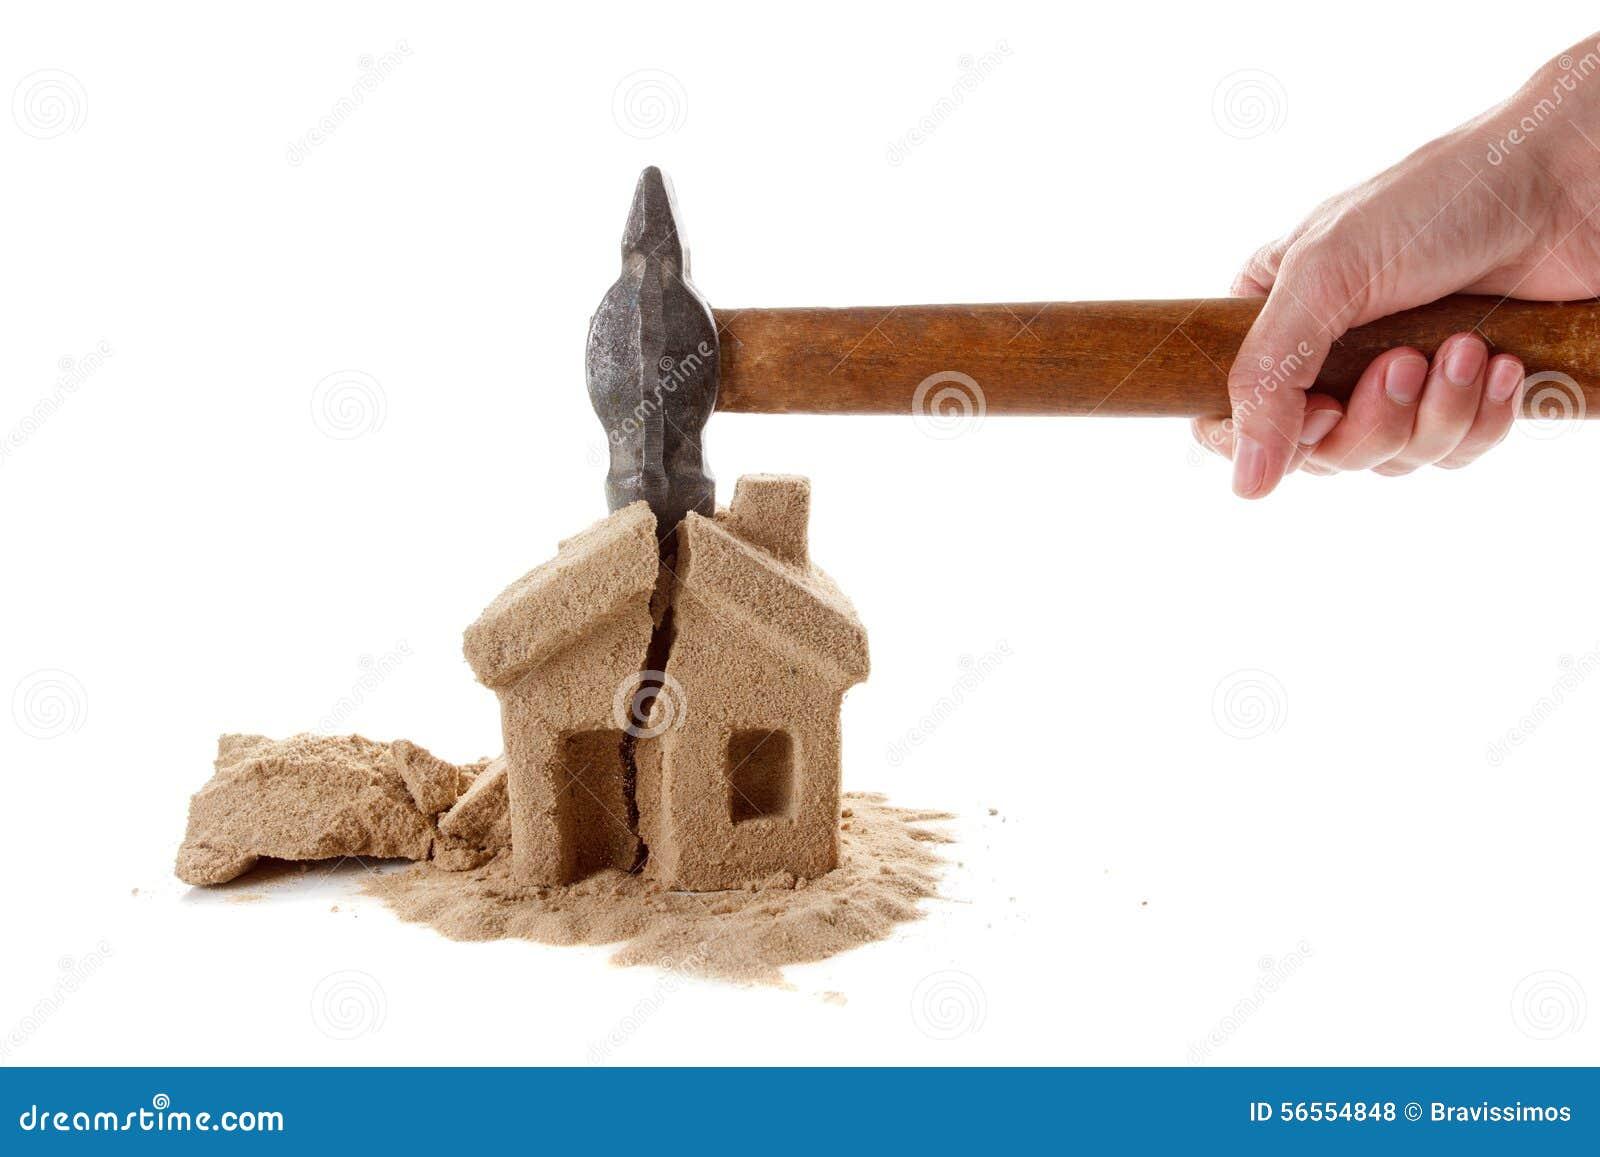 Download Σύλληψη της ιδιοκτησίας Σκληροί νόμοι Πληρεξούσιος βοήθειας σύμβολο Στοκ Εικόνες - εικόνα από πασπαλίζοντας, σπίτι: 56554848